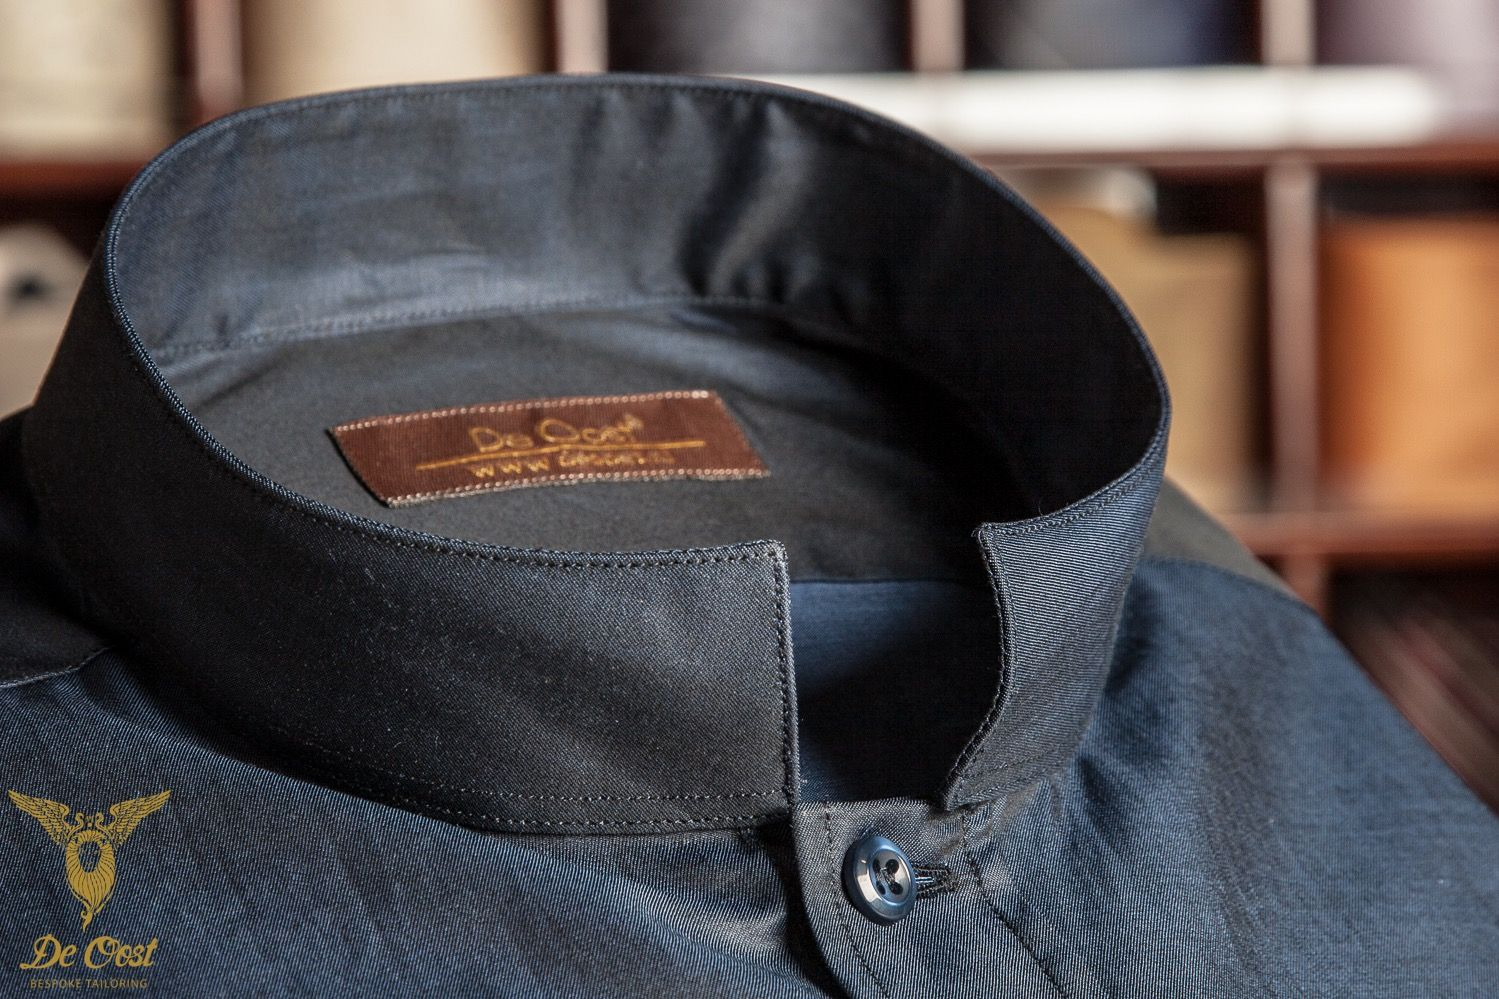 Midnight Blue Plain Broadcloth Dress Shirt With Nehru Collar And